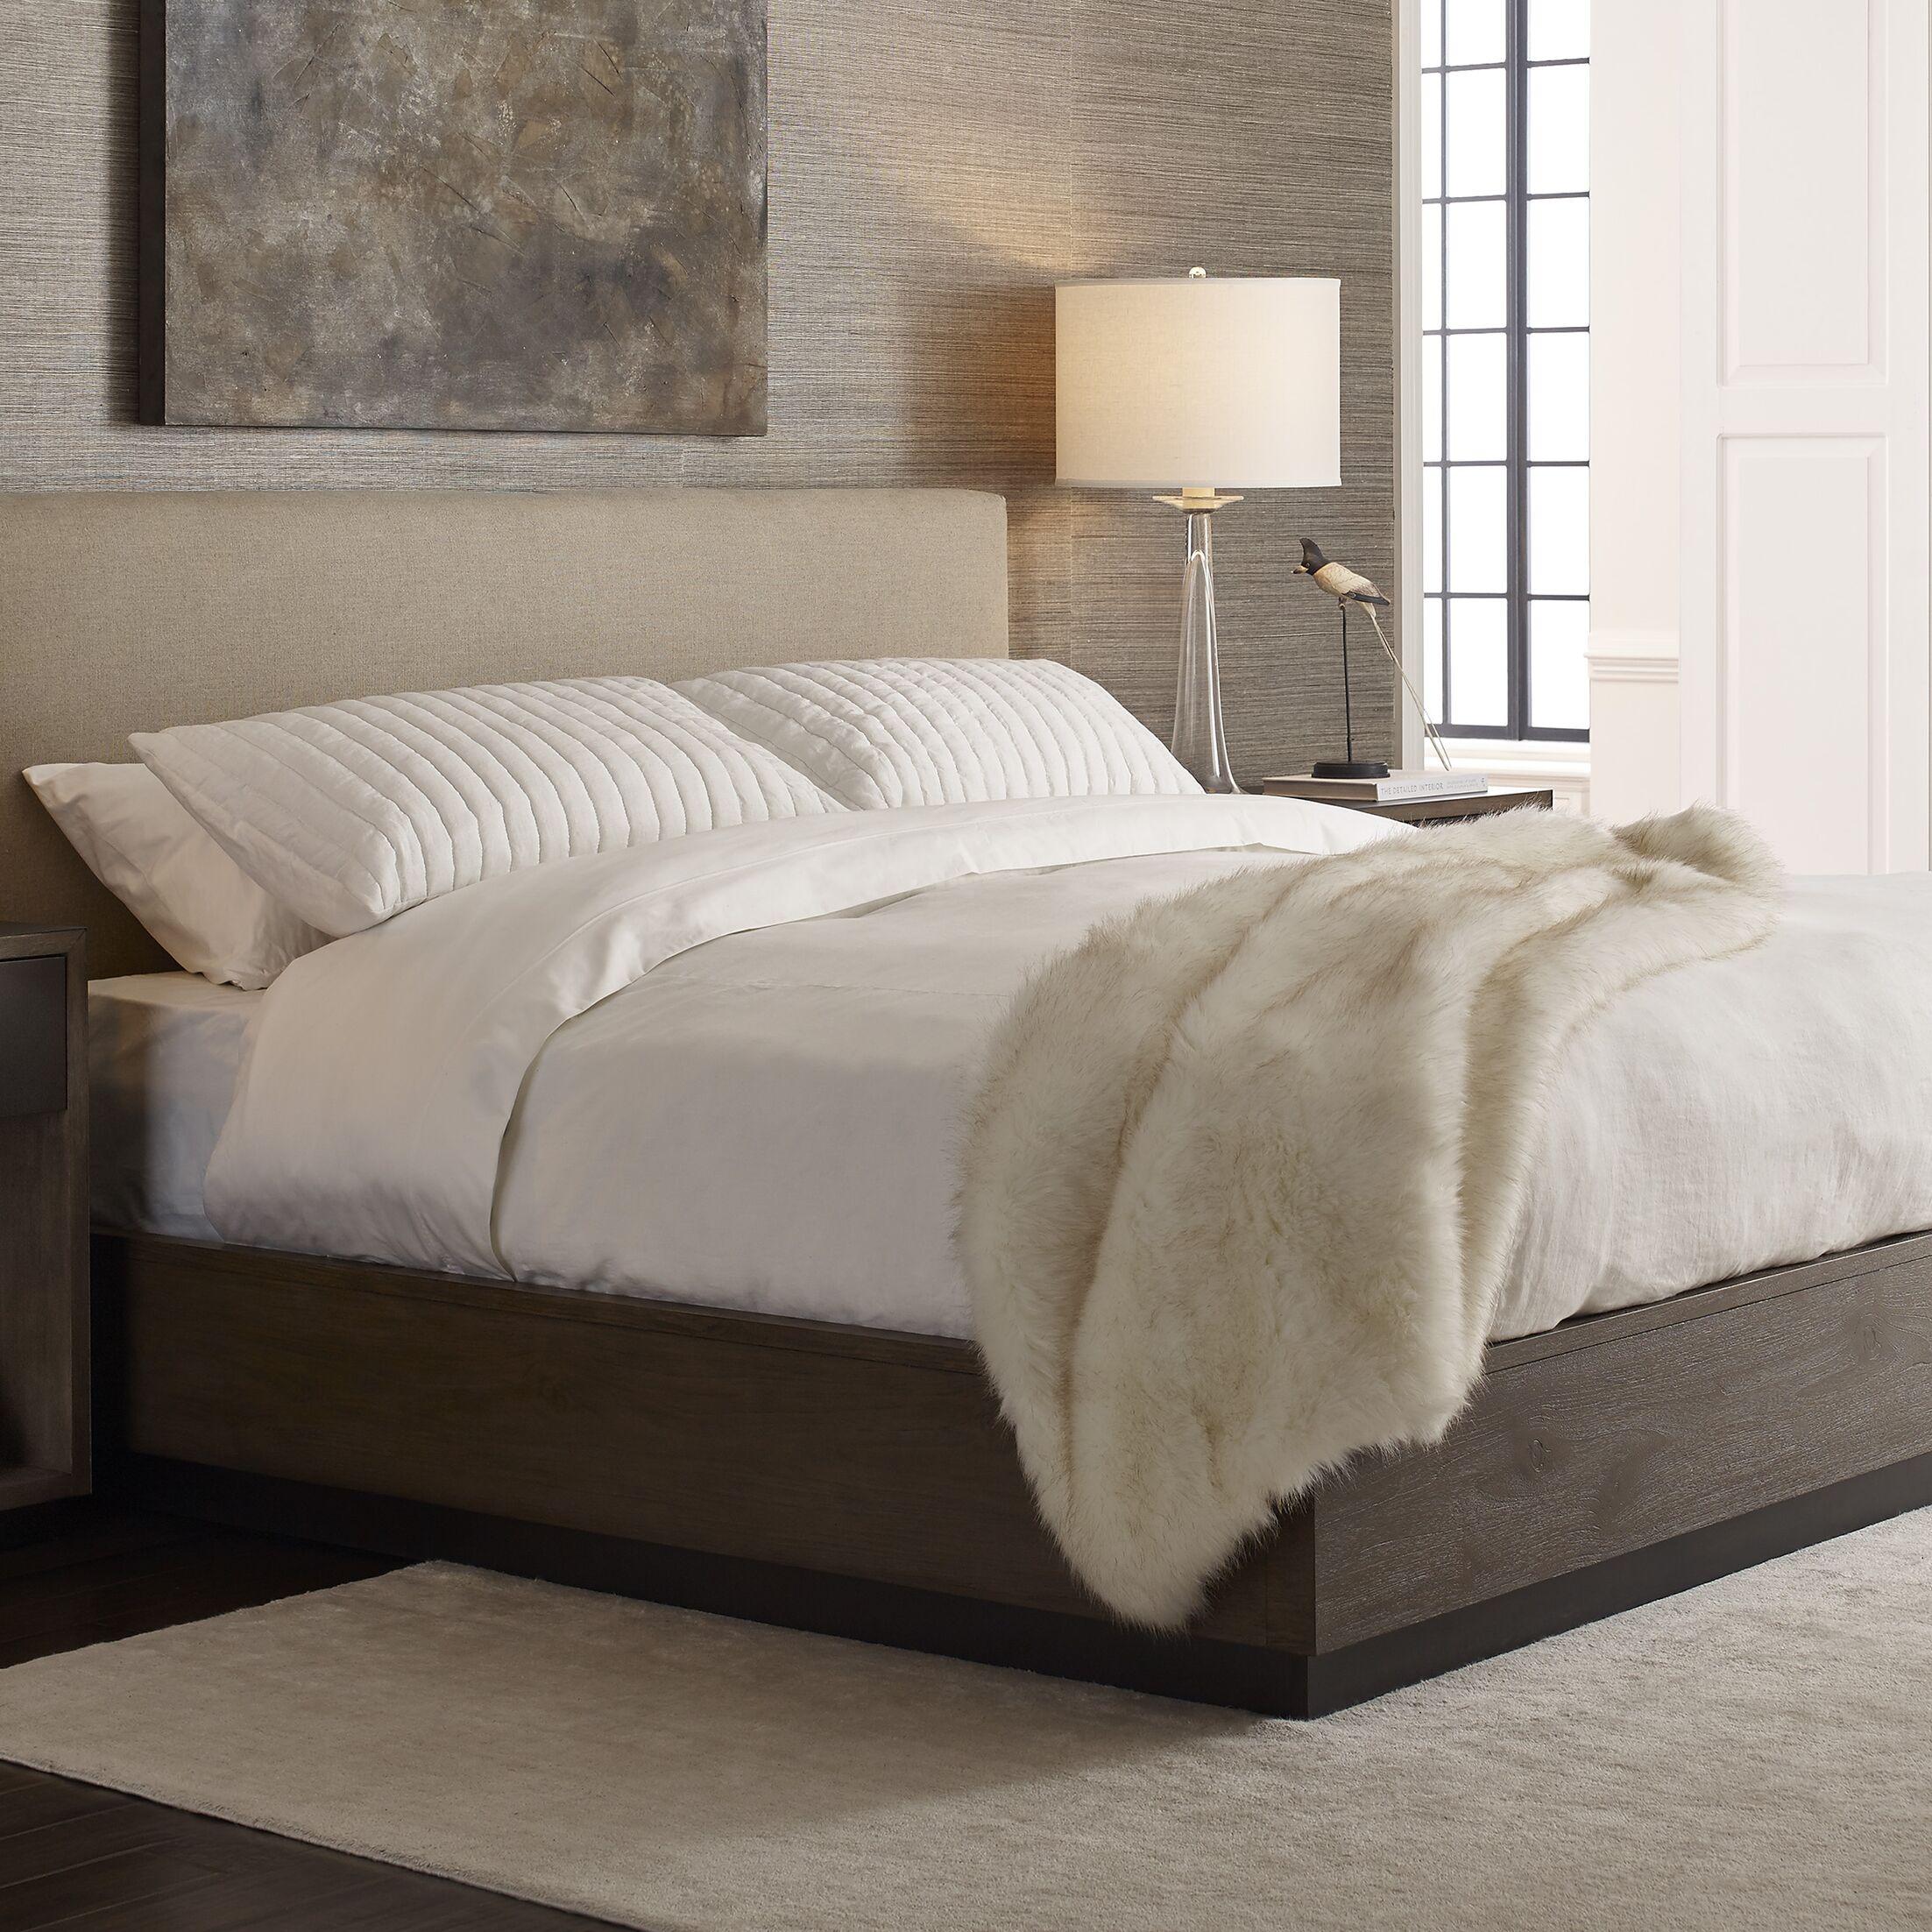 Baldwin Upholstered Panel Bed Size: King